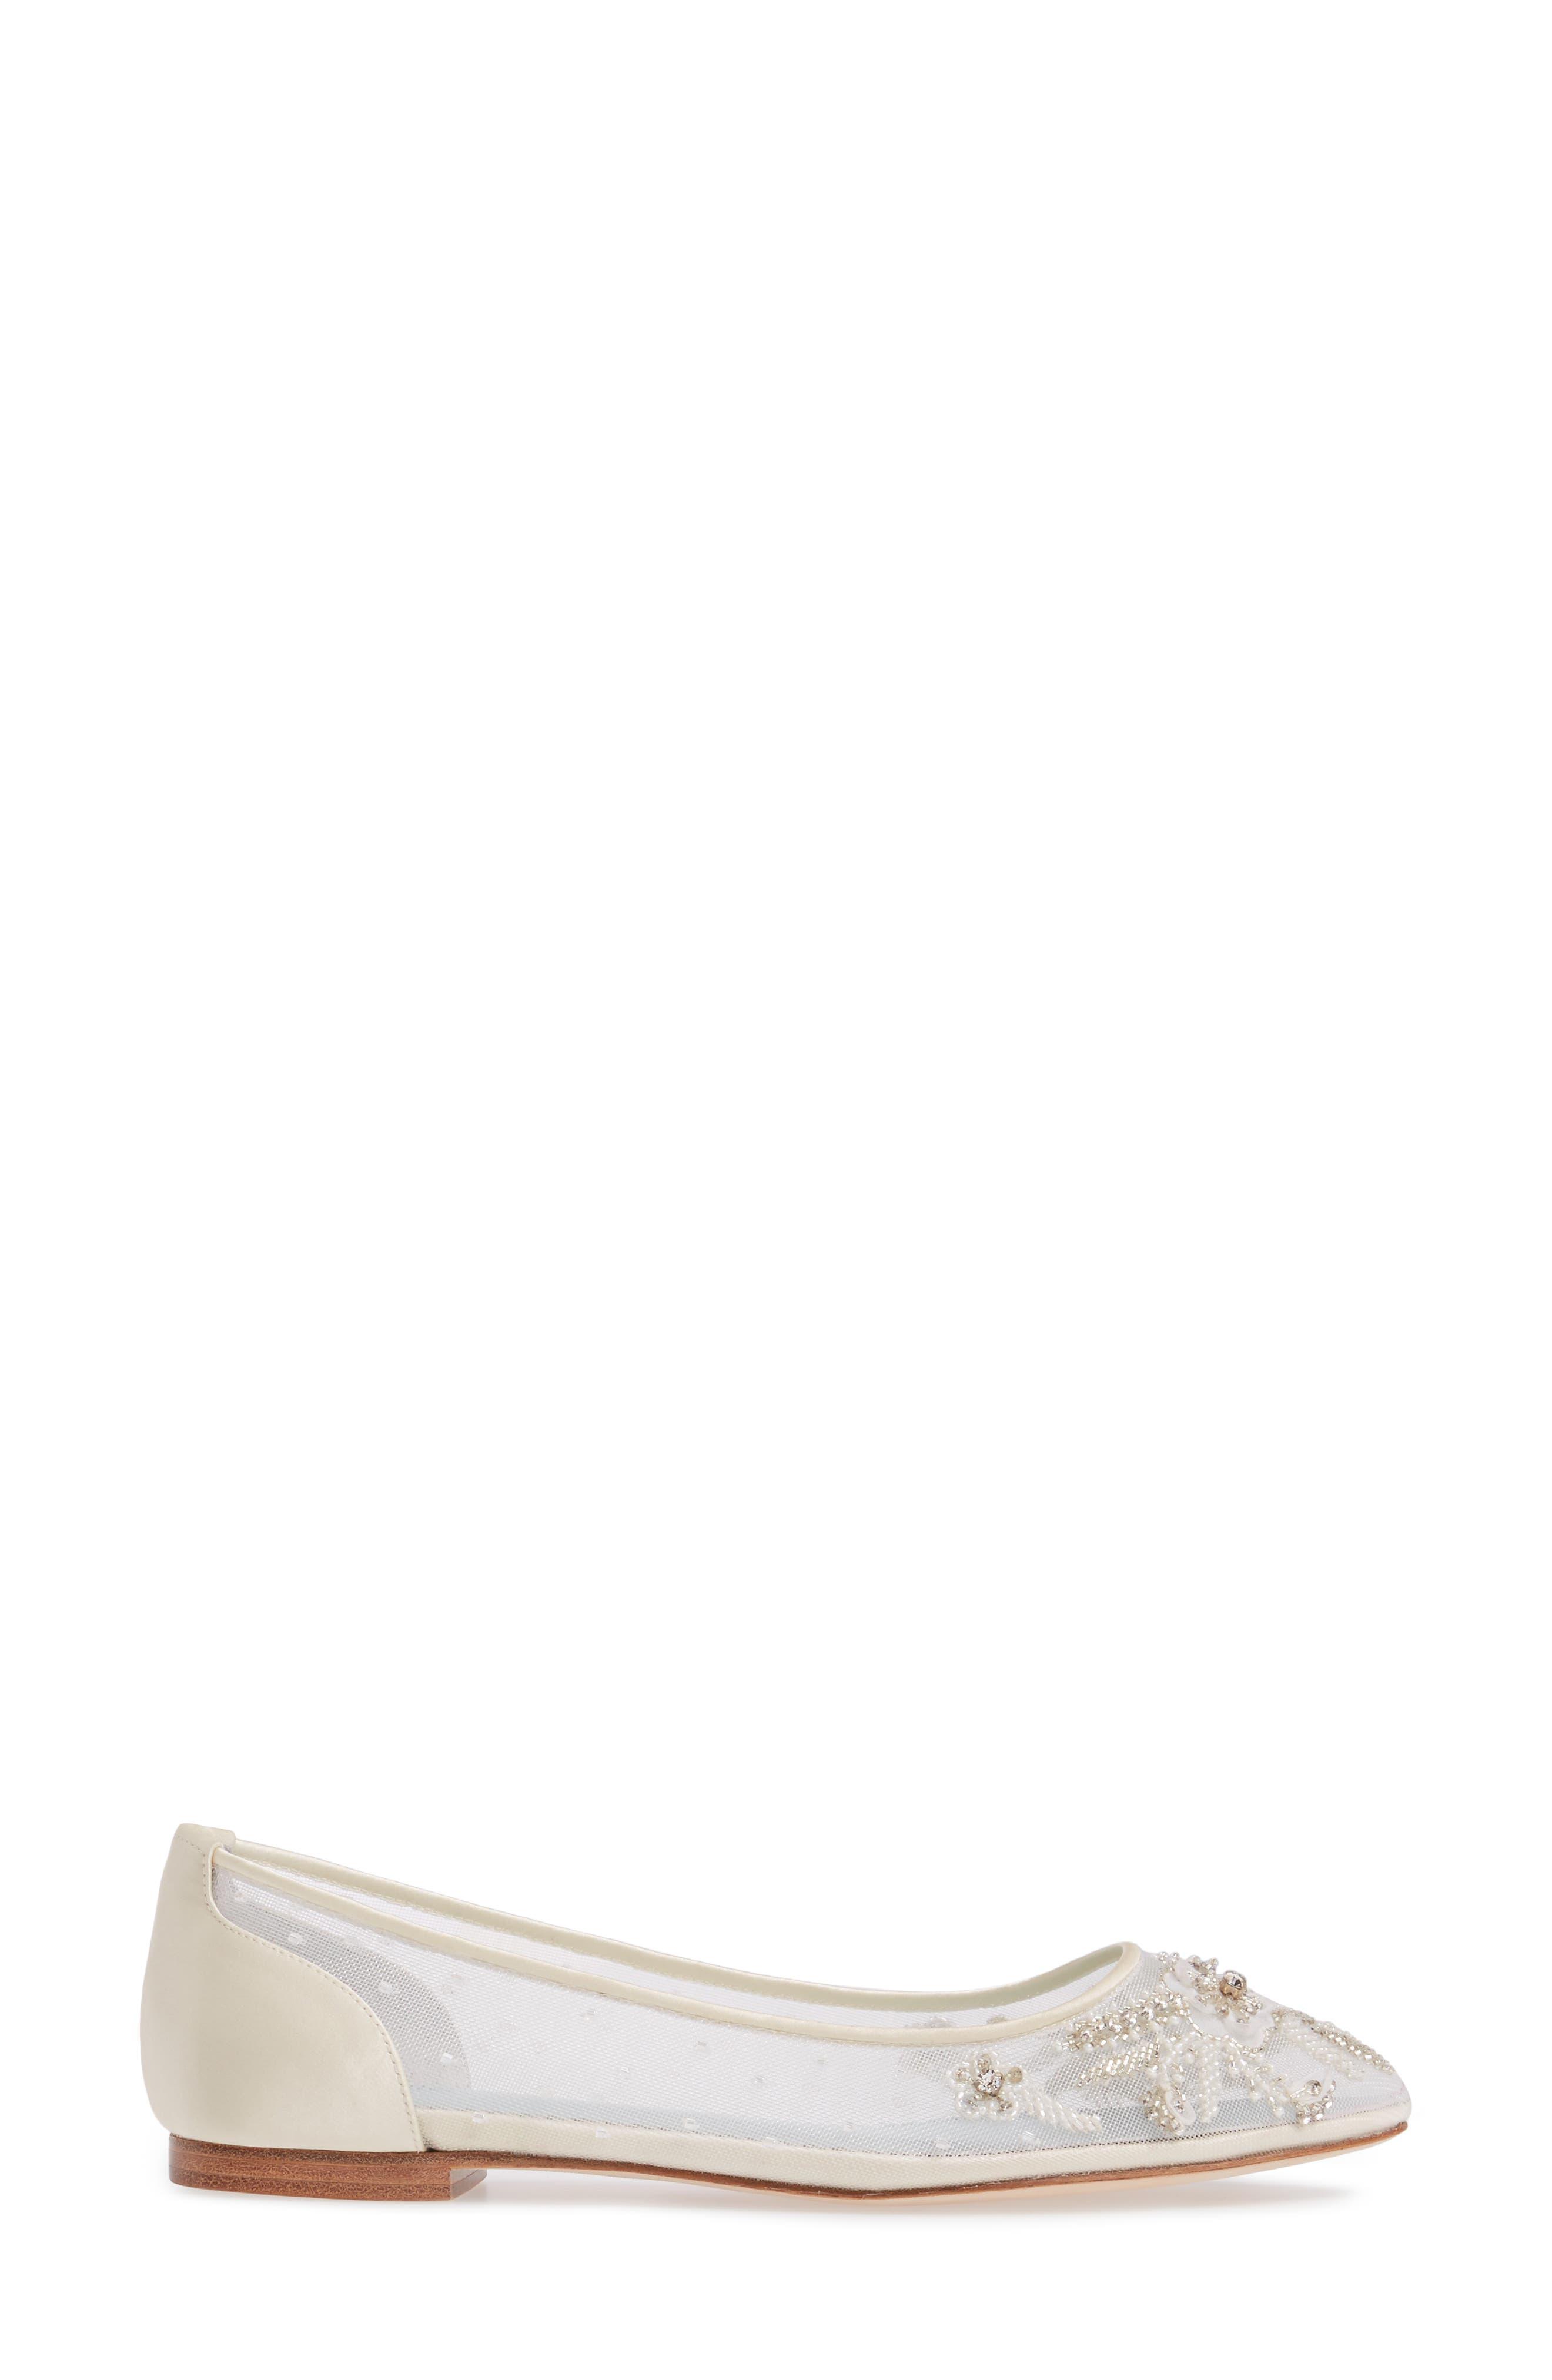 Adora Skimmer Flat,                             Alternate thumbnail 3, color,                             IVORY FABRIC